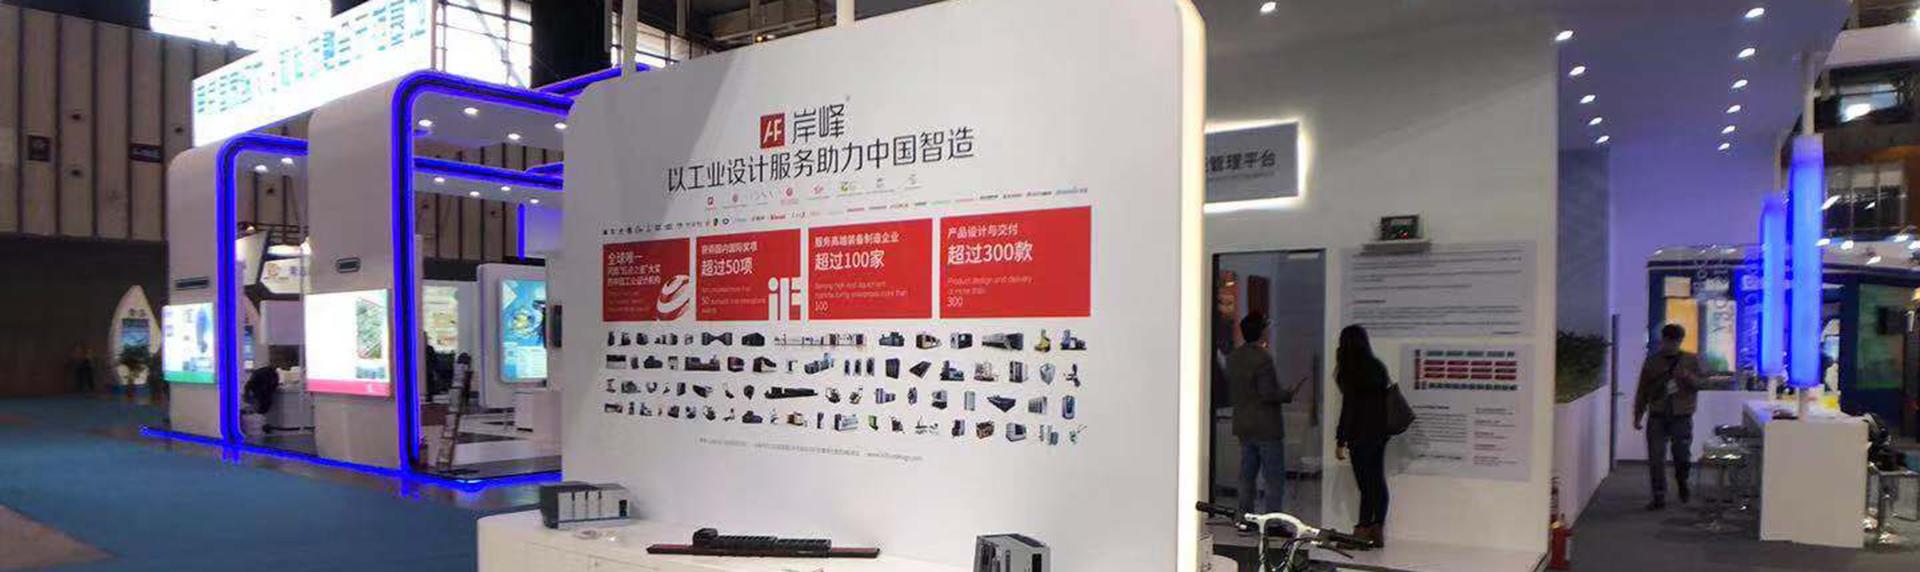 S10娱乐新闻-中国(南京)文化科技融合成果交易会展台设计